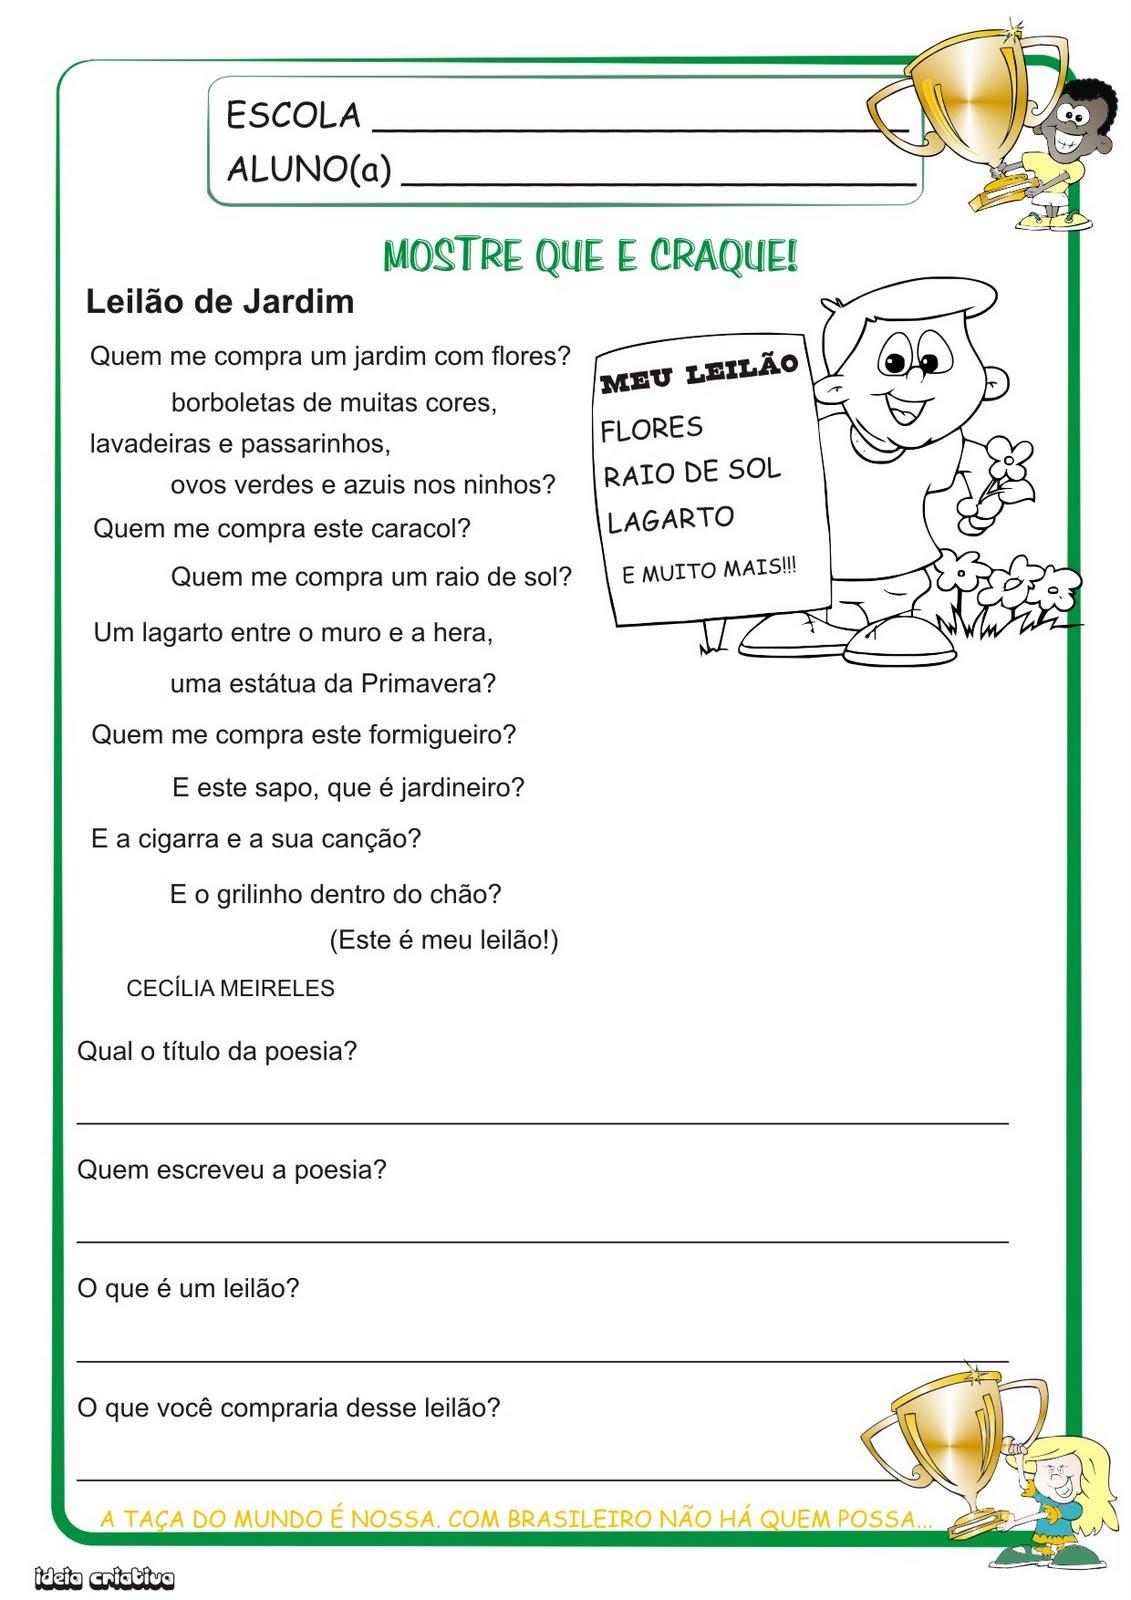 Atividade Língua Portuguesa 1° Ano Poesia da Pimavera